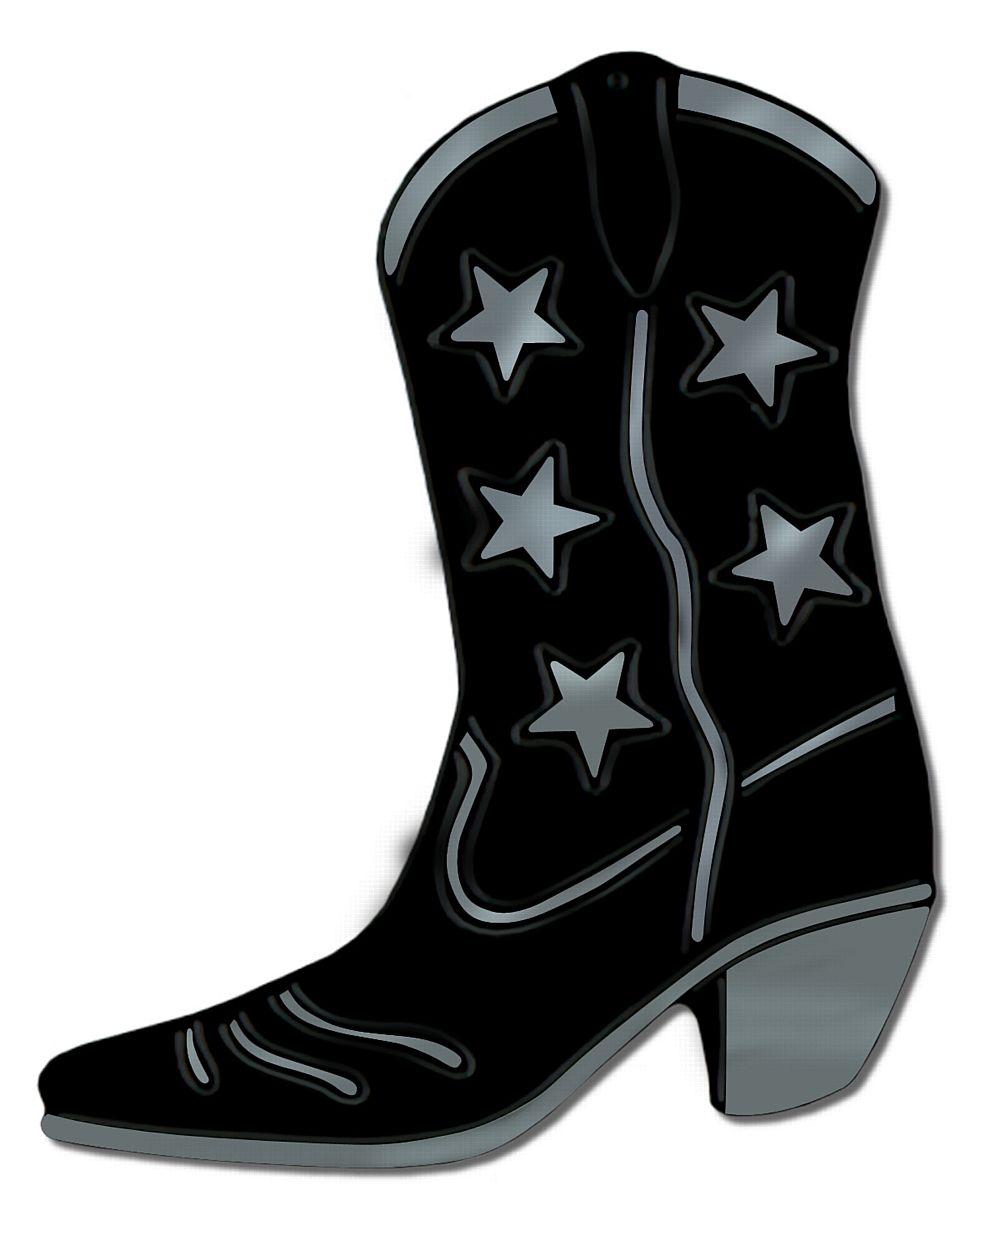 ffc21f753c6ba Cartoon cowboy boots clip art indian costumes cowboy and cowgirl ...